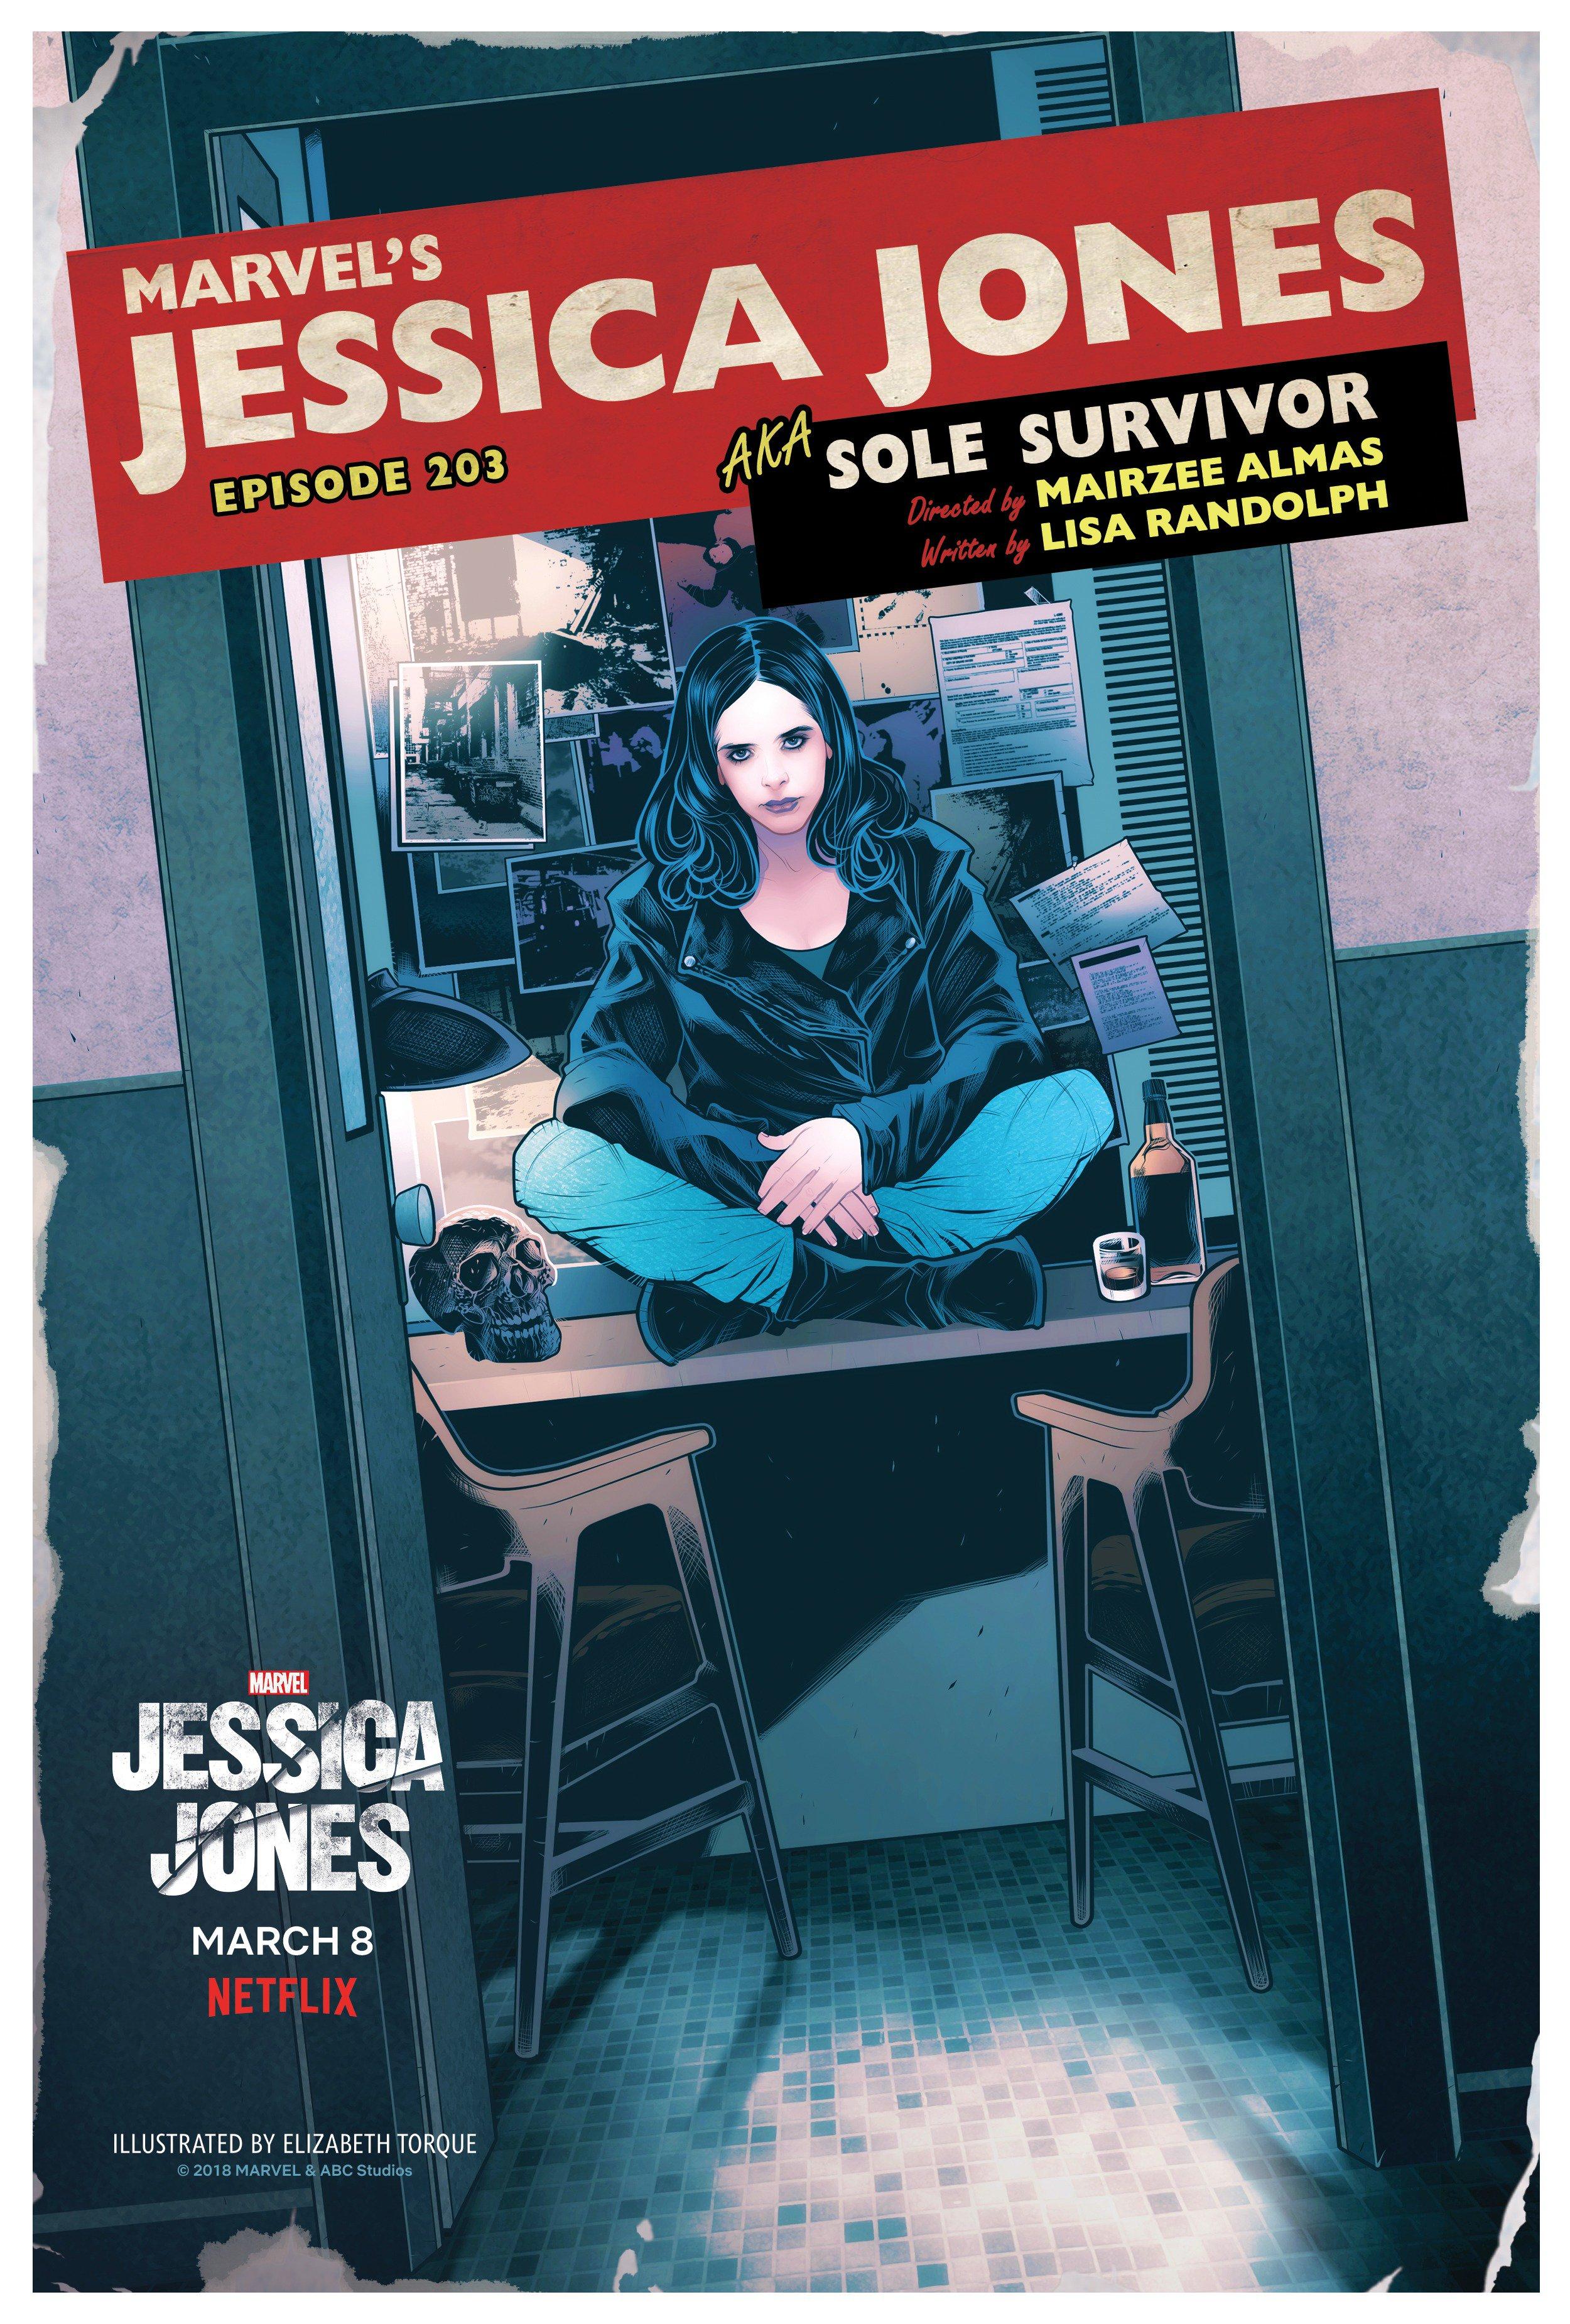 JESSICA JONES: Netflix Reveals Season 2 Episode Titles